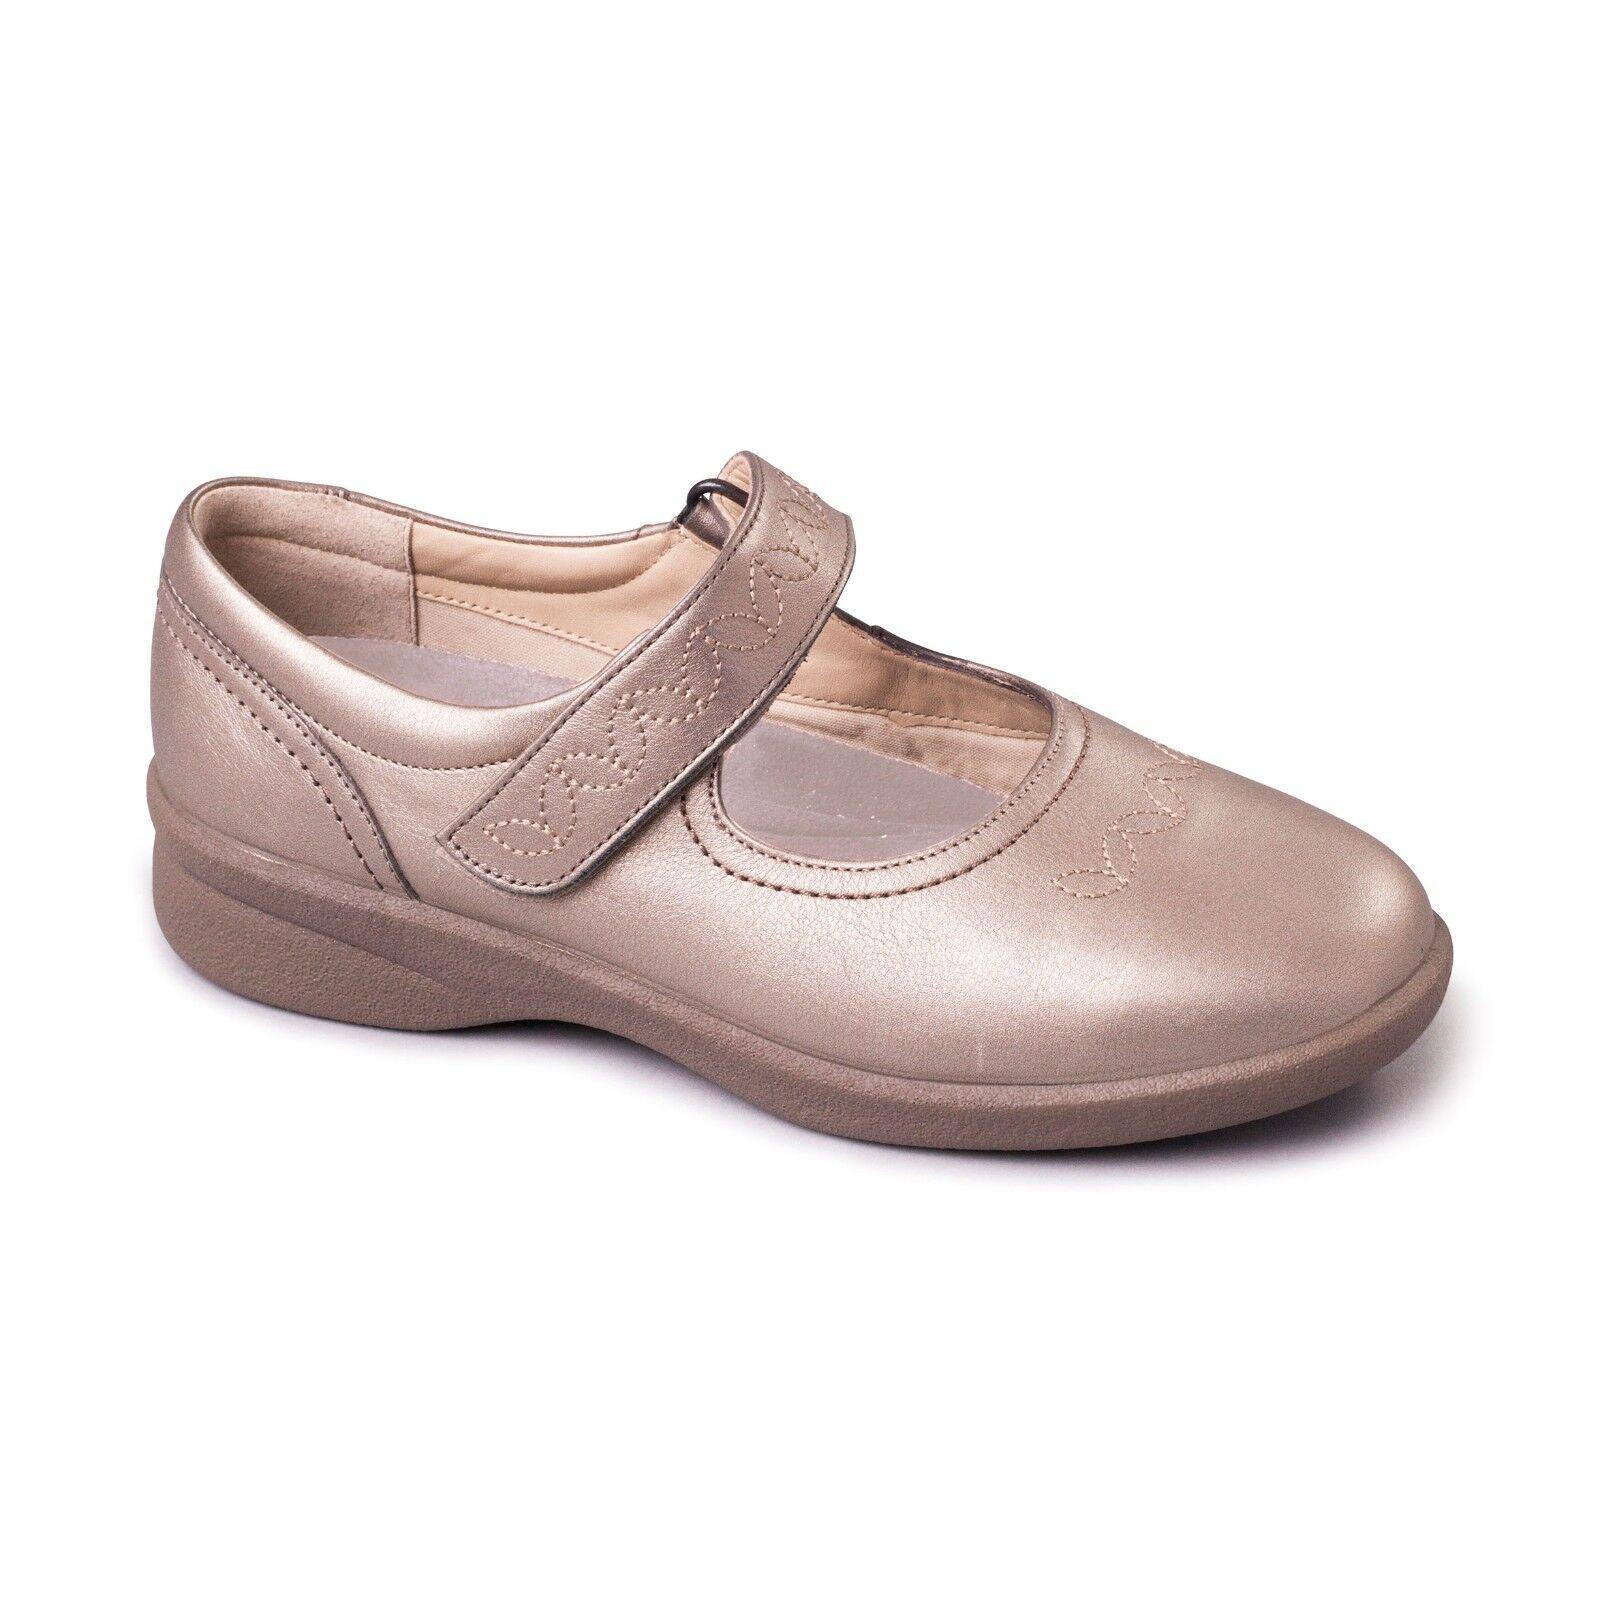 Moda barata y hermosa Descuento por tiempo limitado Padders Sprite 2 Ladies Casual Mary Jane Wide 3E/4E Dual Fitting Shoes Pewter